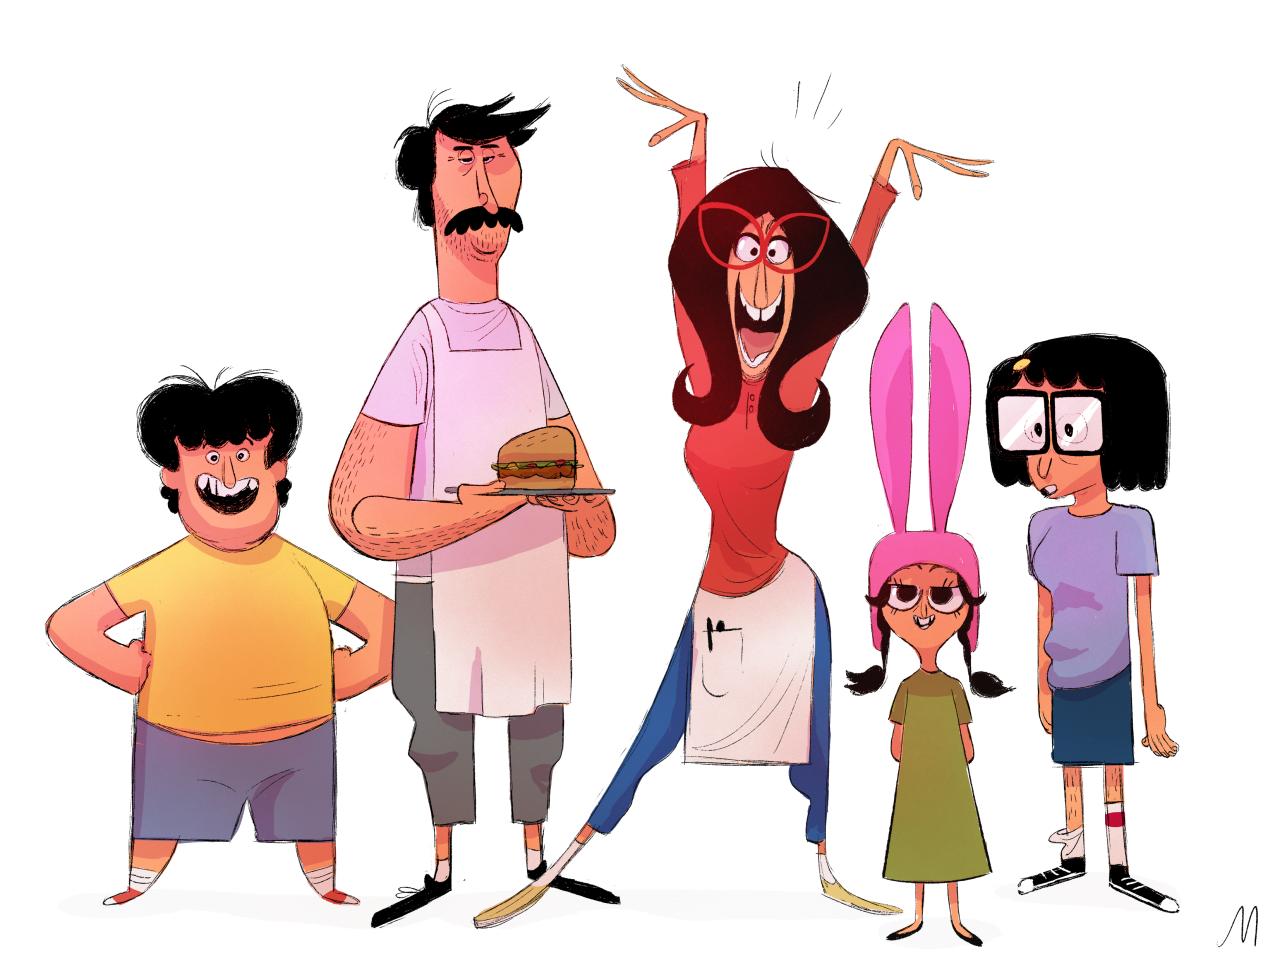 Art of jason mclean photo character design bobs burgers